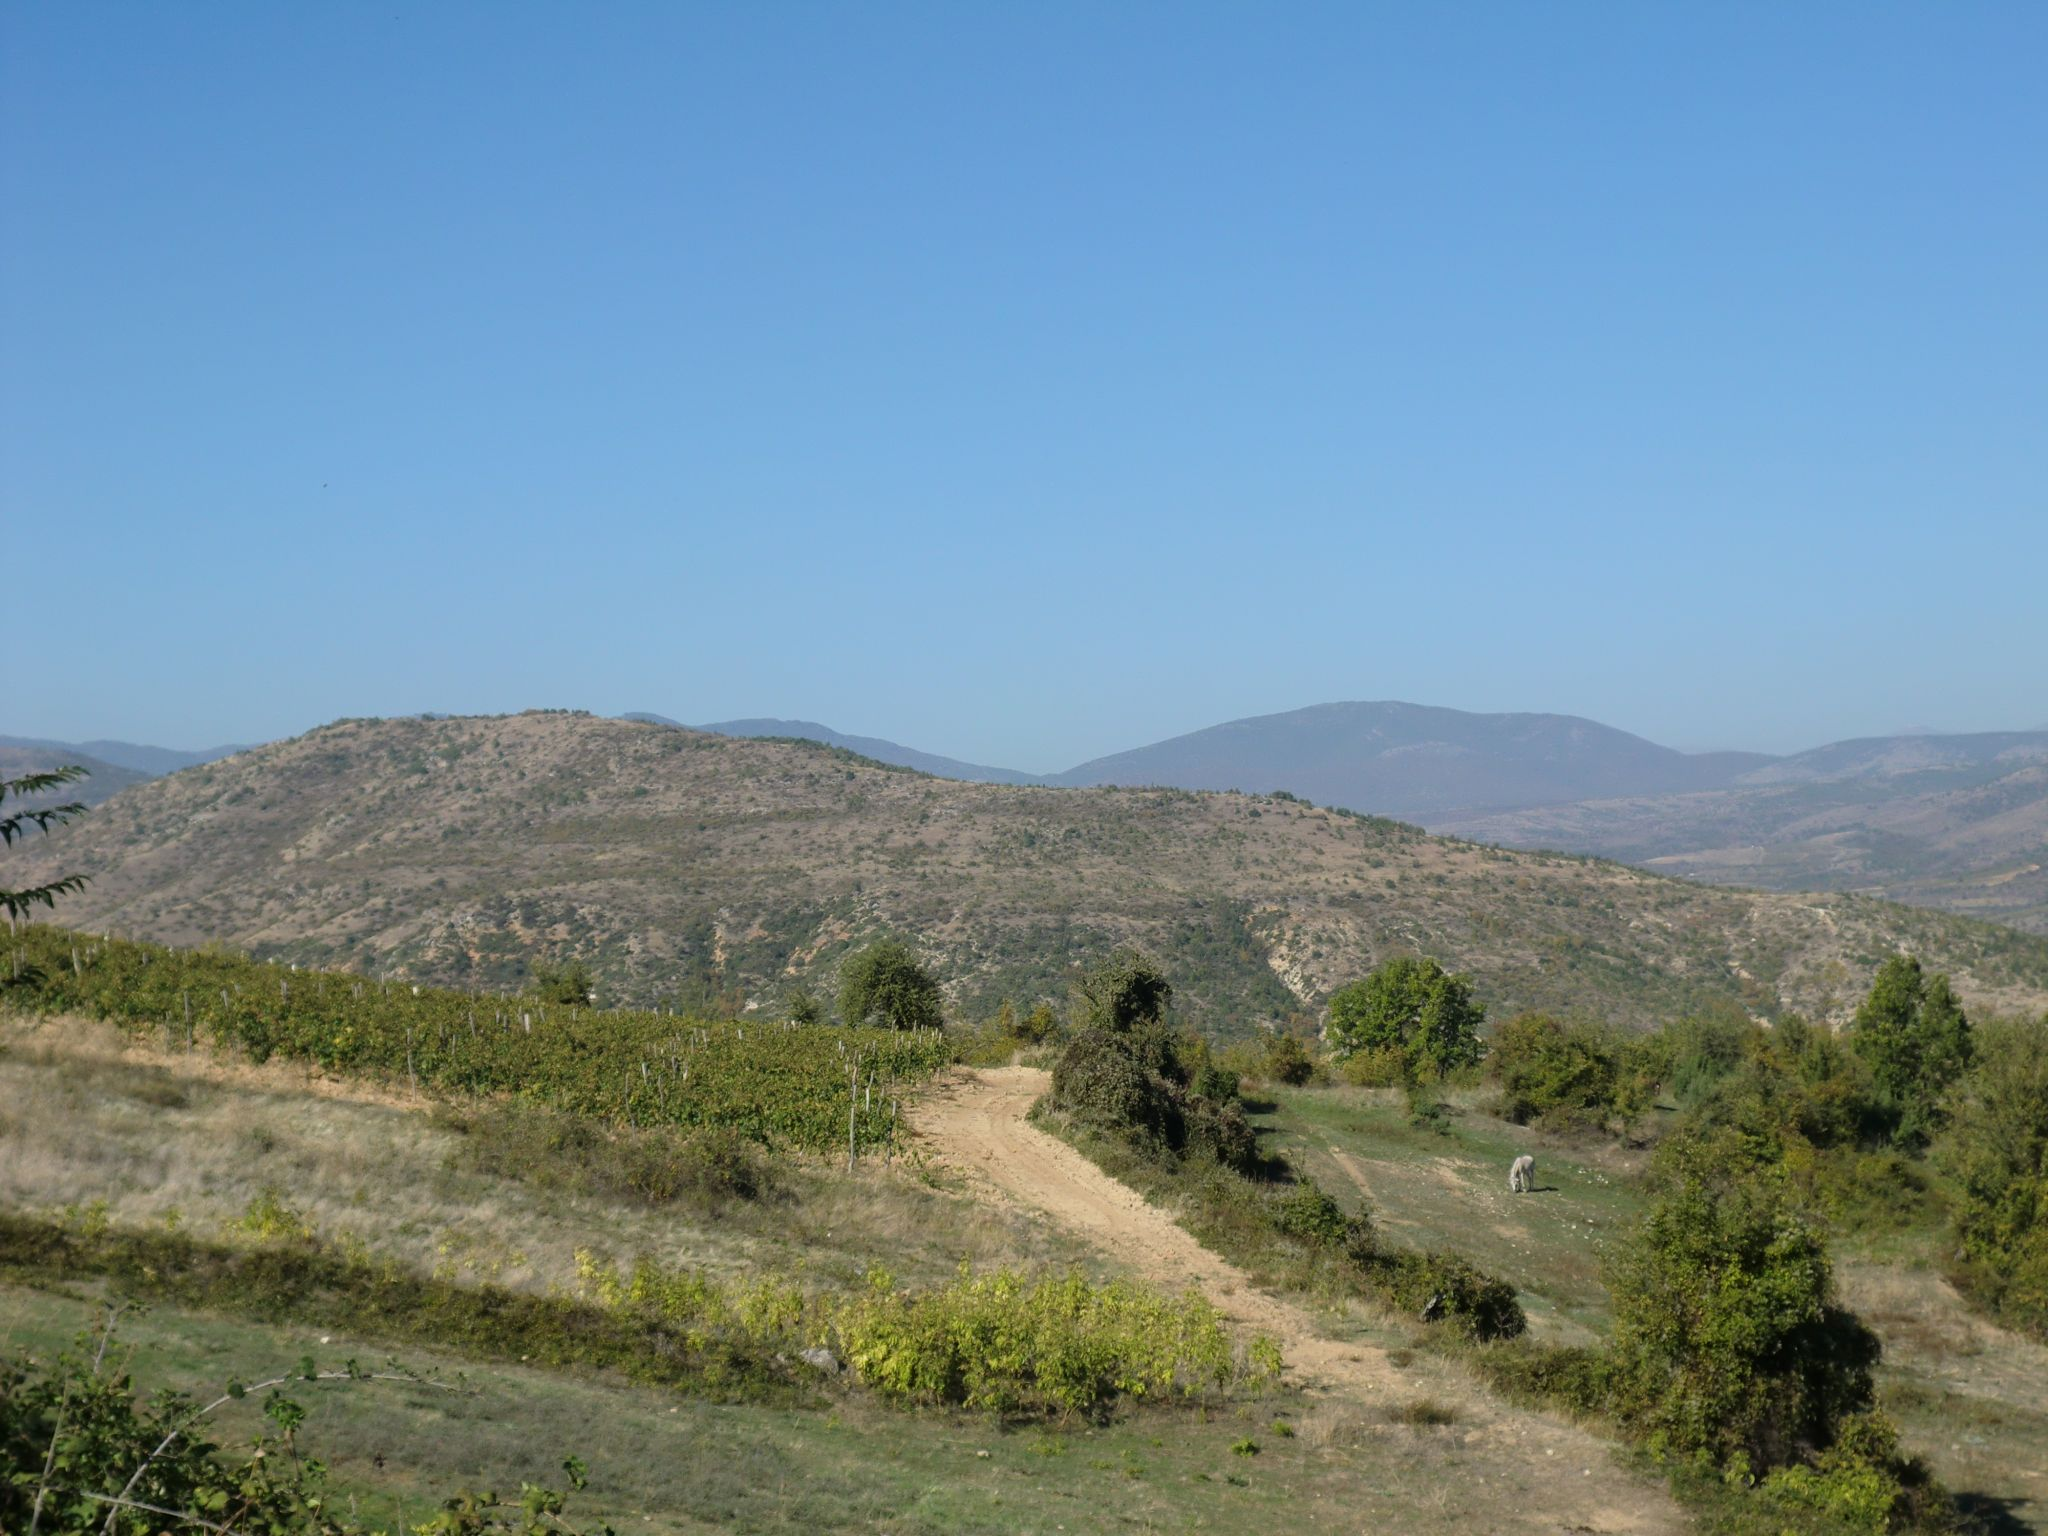 CIMG0139 - Macedonian landscapes